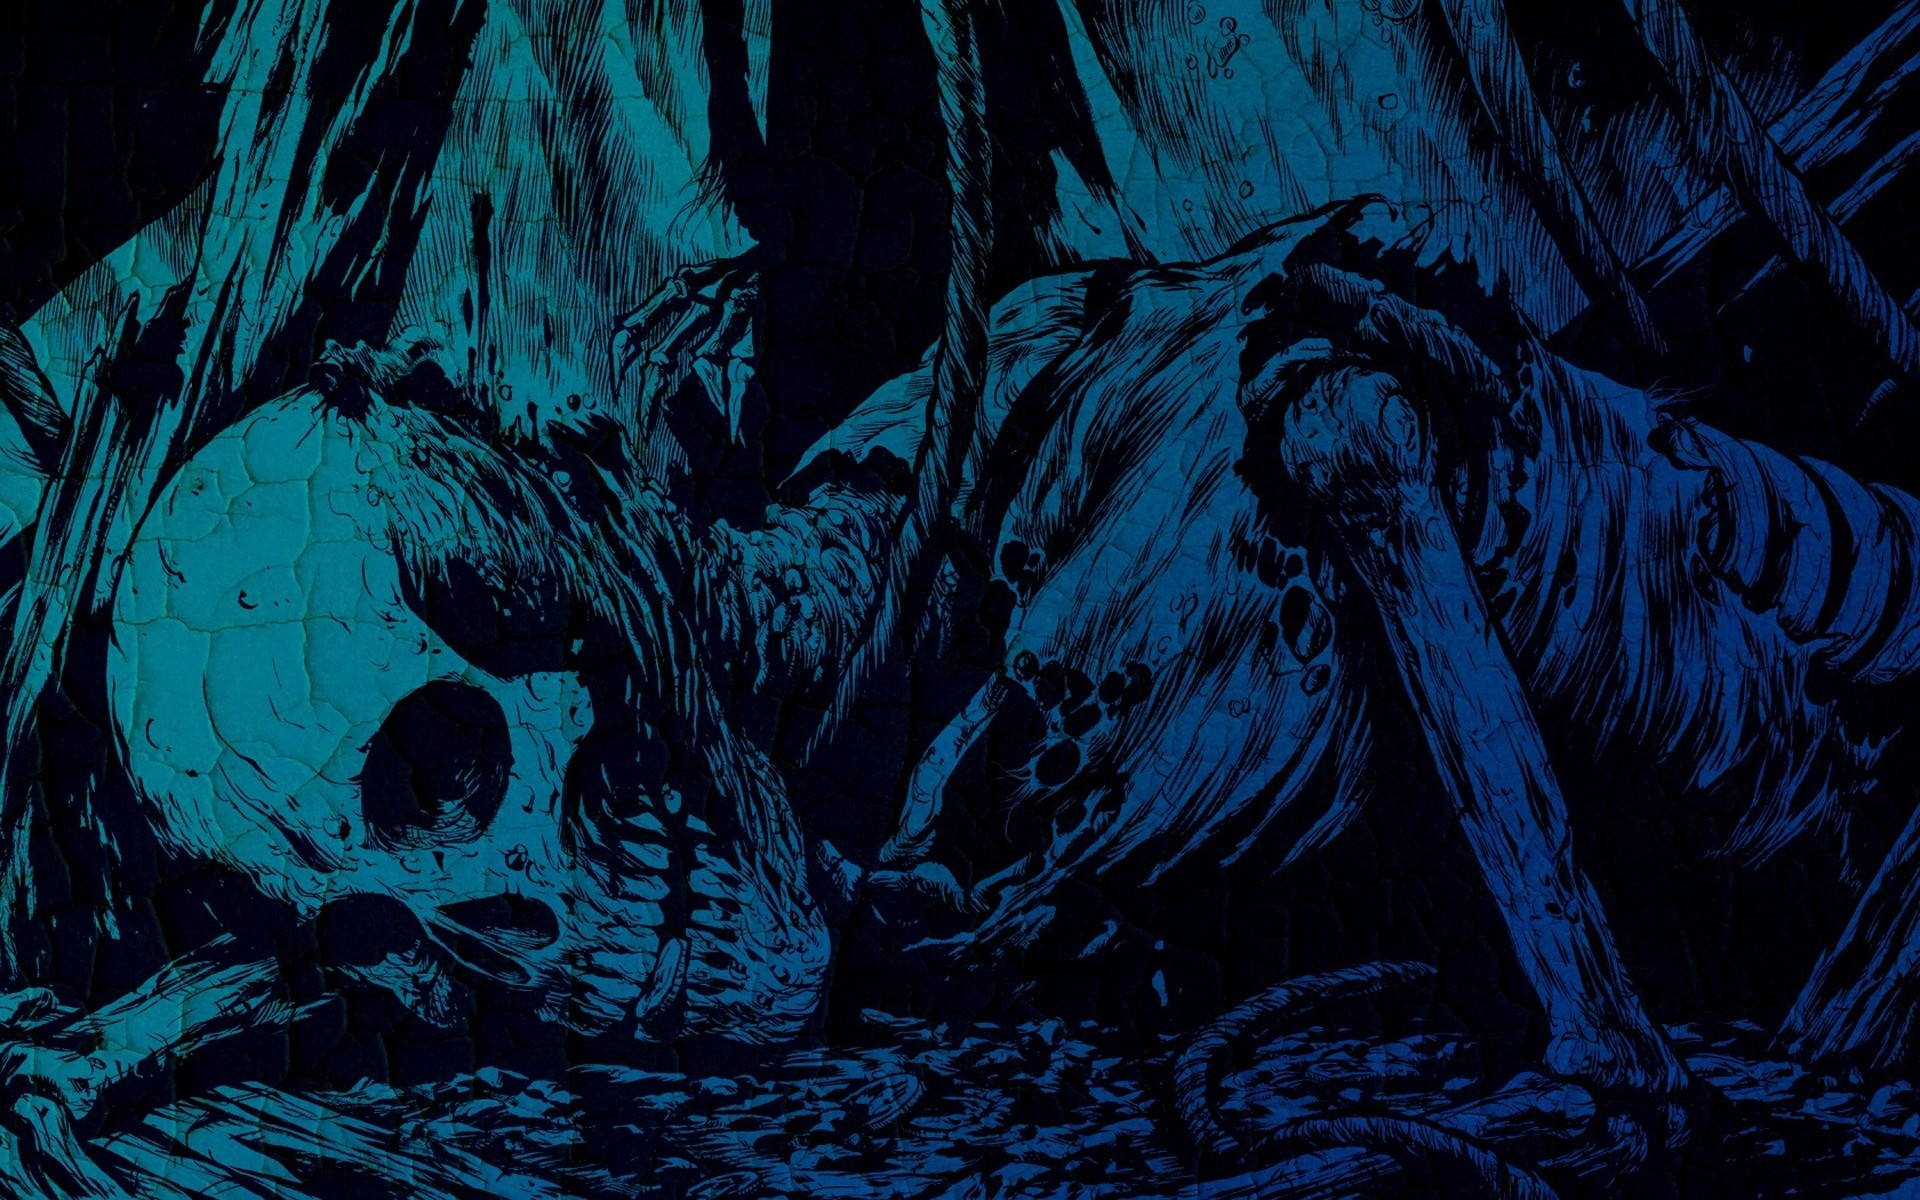 Incredible Neon Skull Wallpaper: Blue Skull Wallpaper (59+ Images